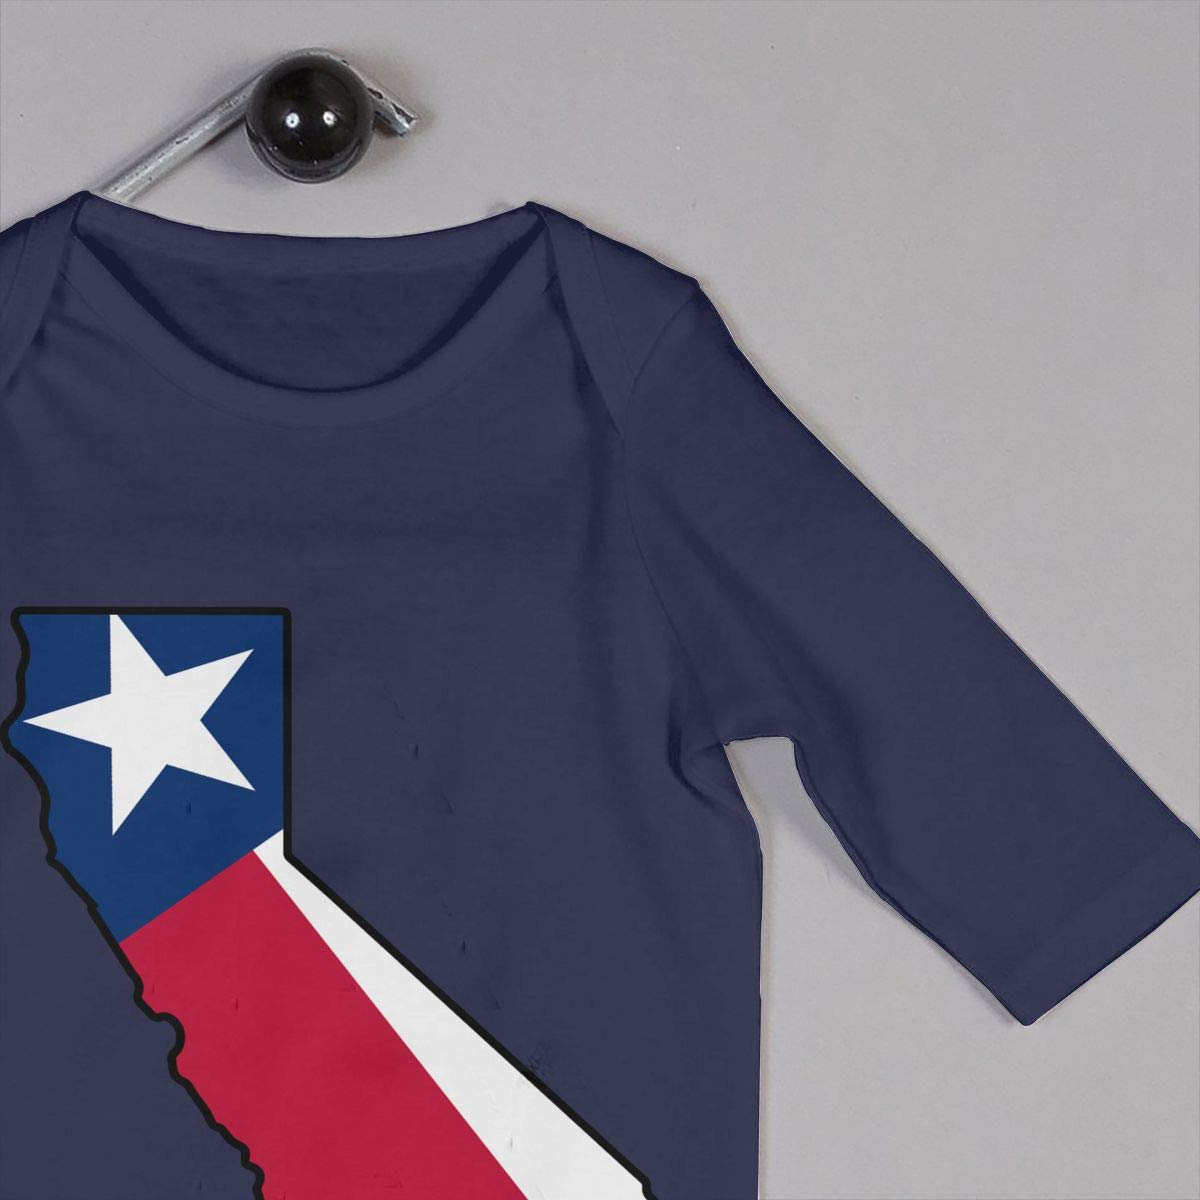 LBJQ8 California Outline Texas Flag Newborn Kids Baby Boys Long Sleeve Romper Pajama Clothes